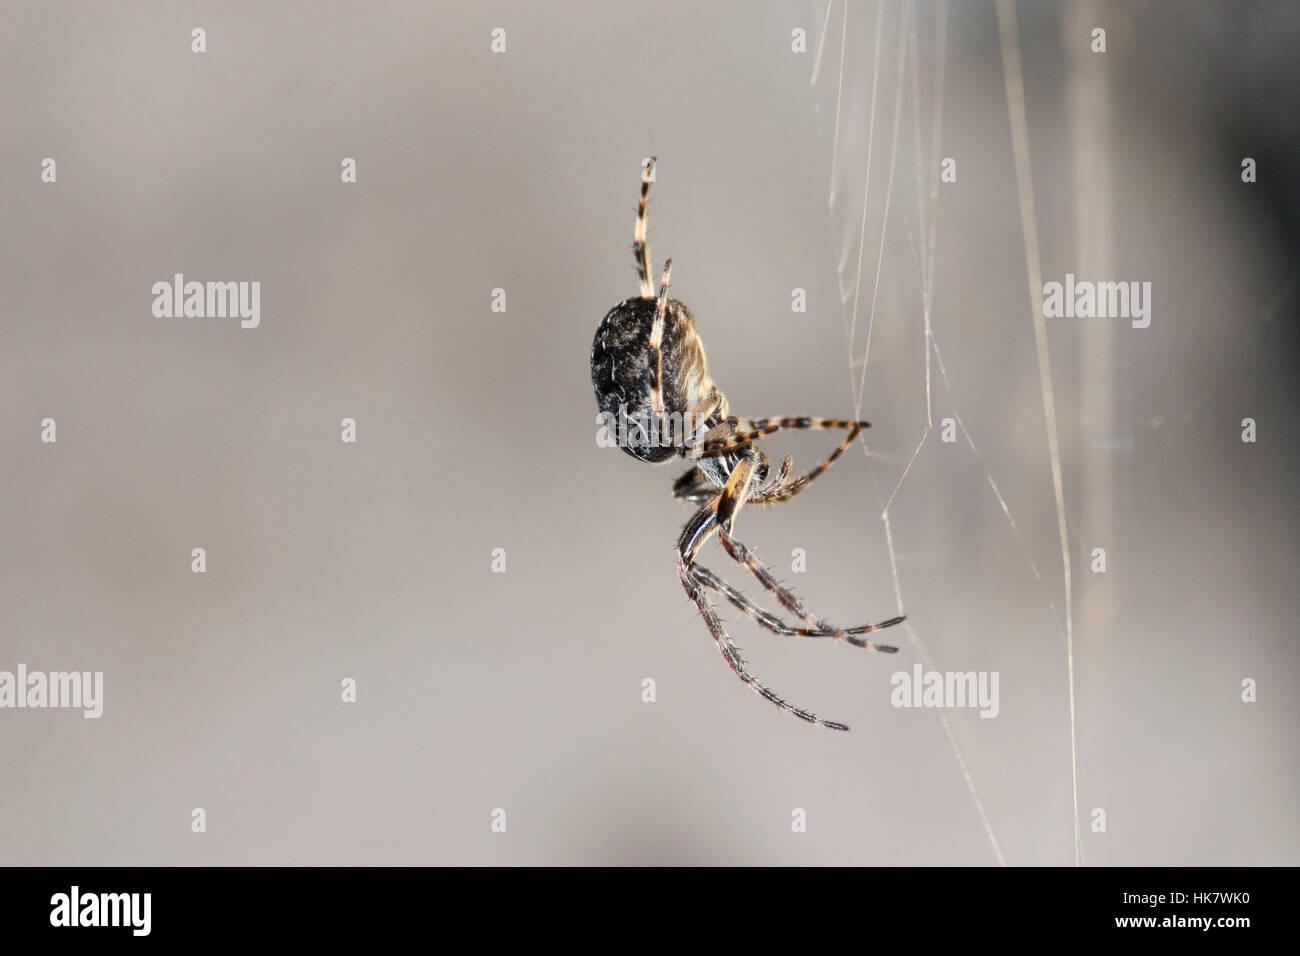 Wildlife: Furrow Spider or furrow orb spider or foliate spider. (Larinioides sclopetarius). Found under a road bridge - Stock Image